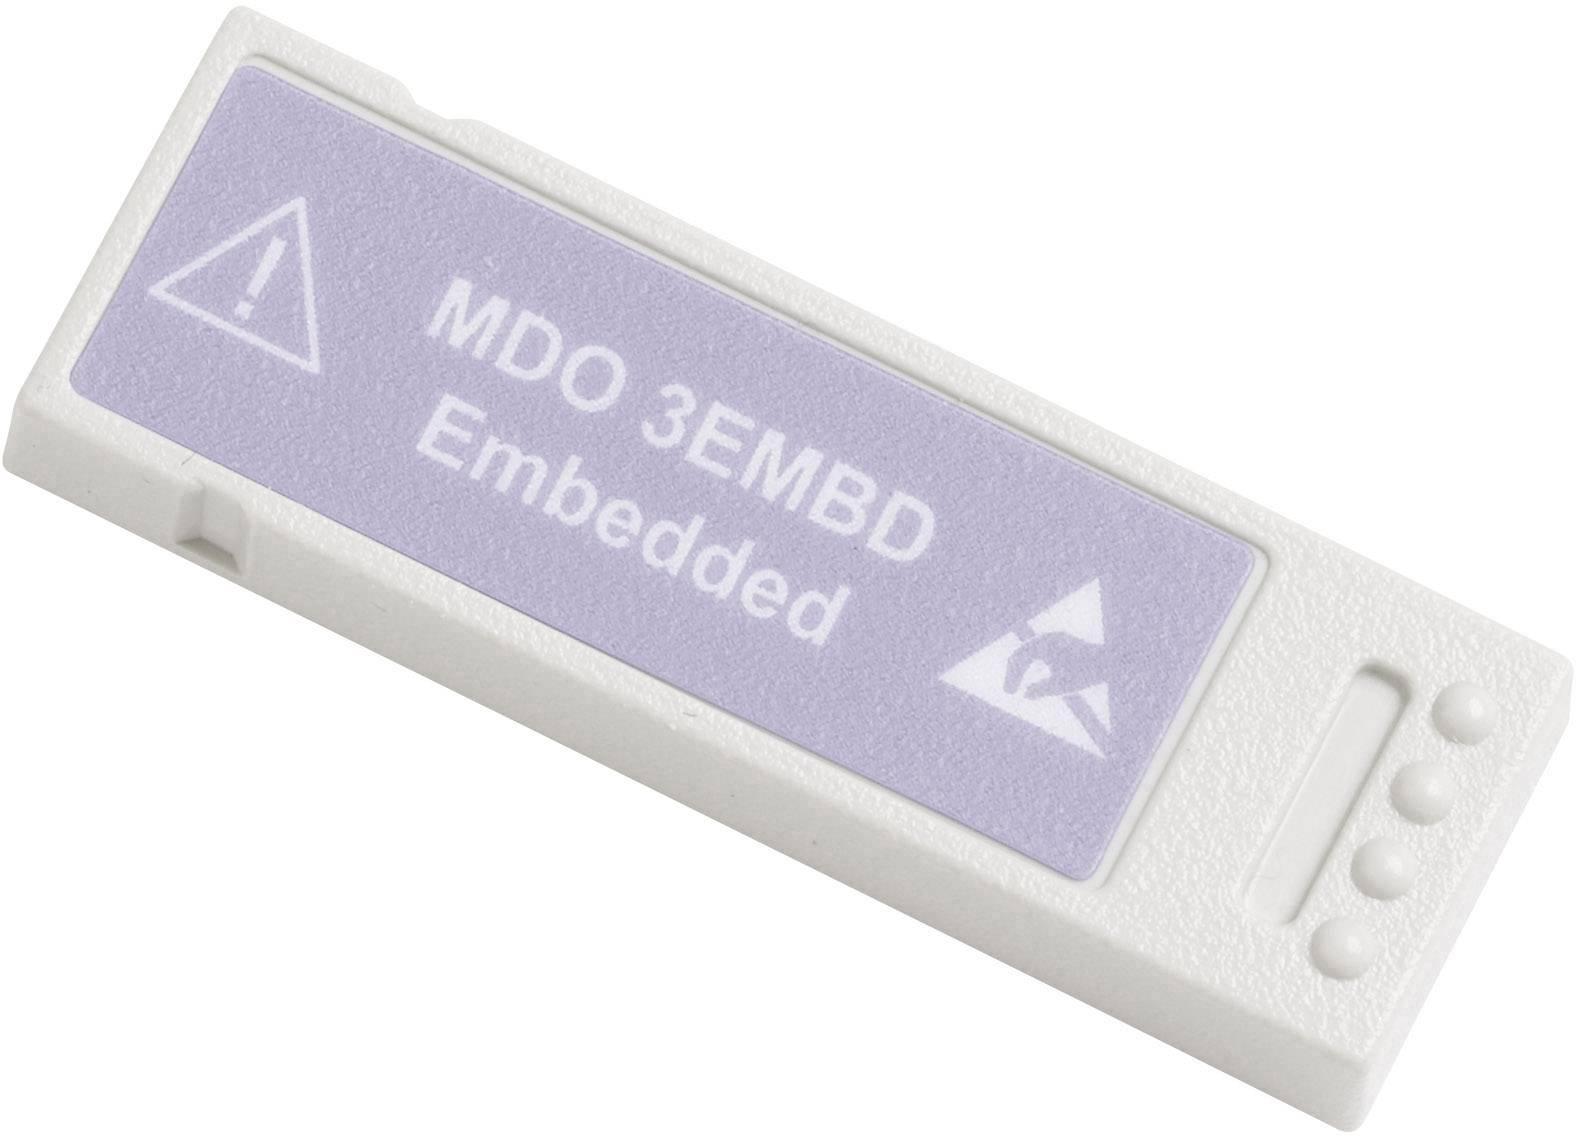 Tektronix MDO3EMBD MDO3EMBD